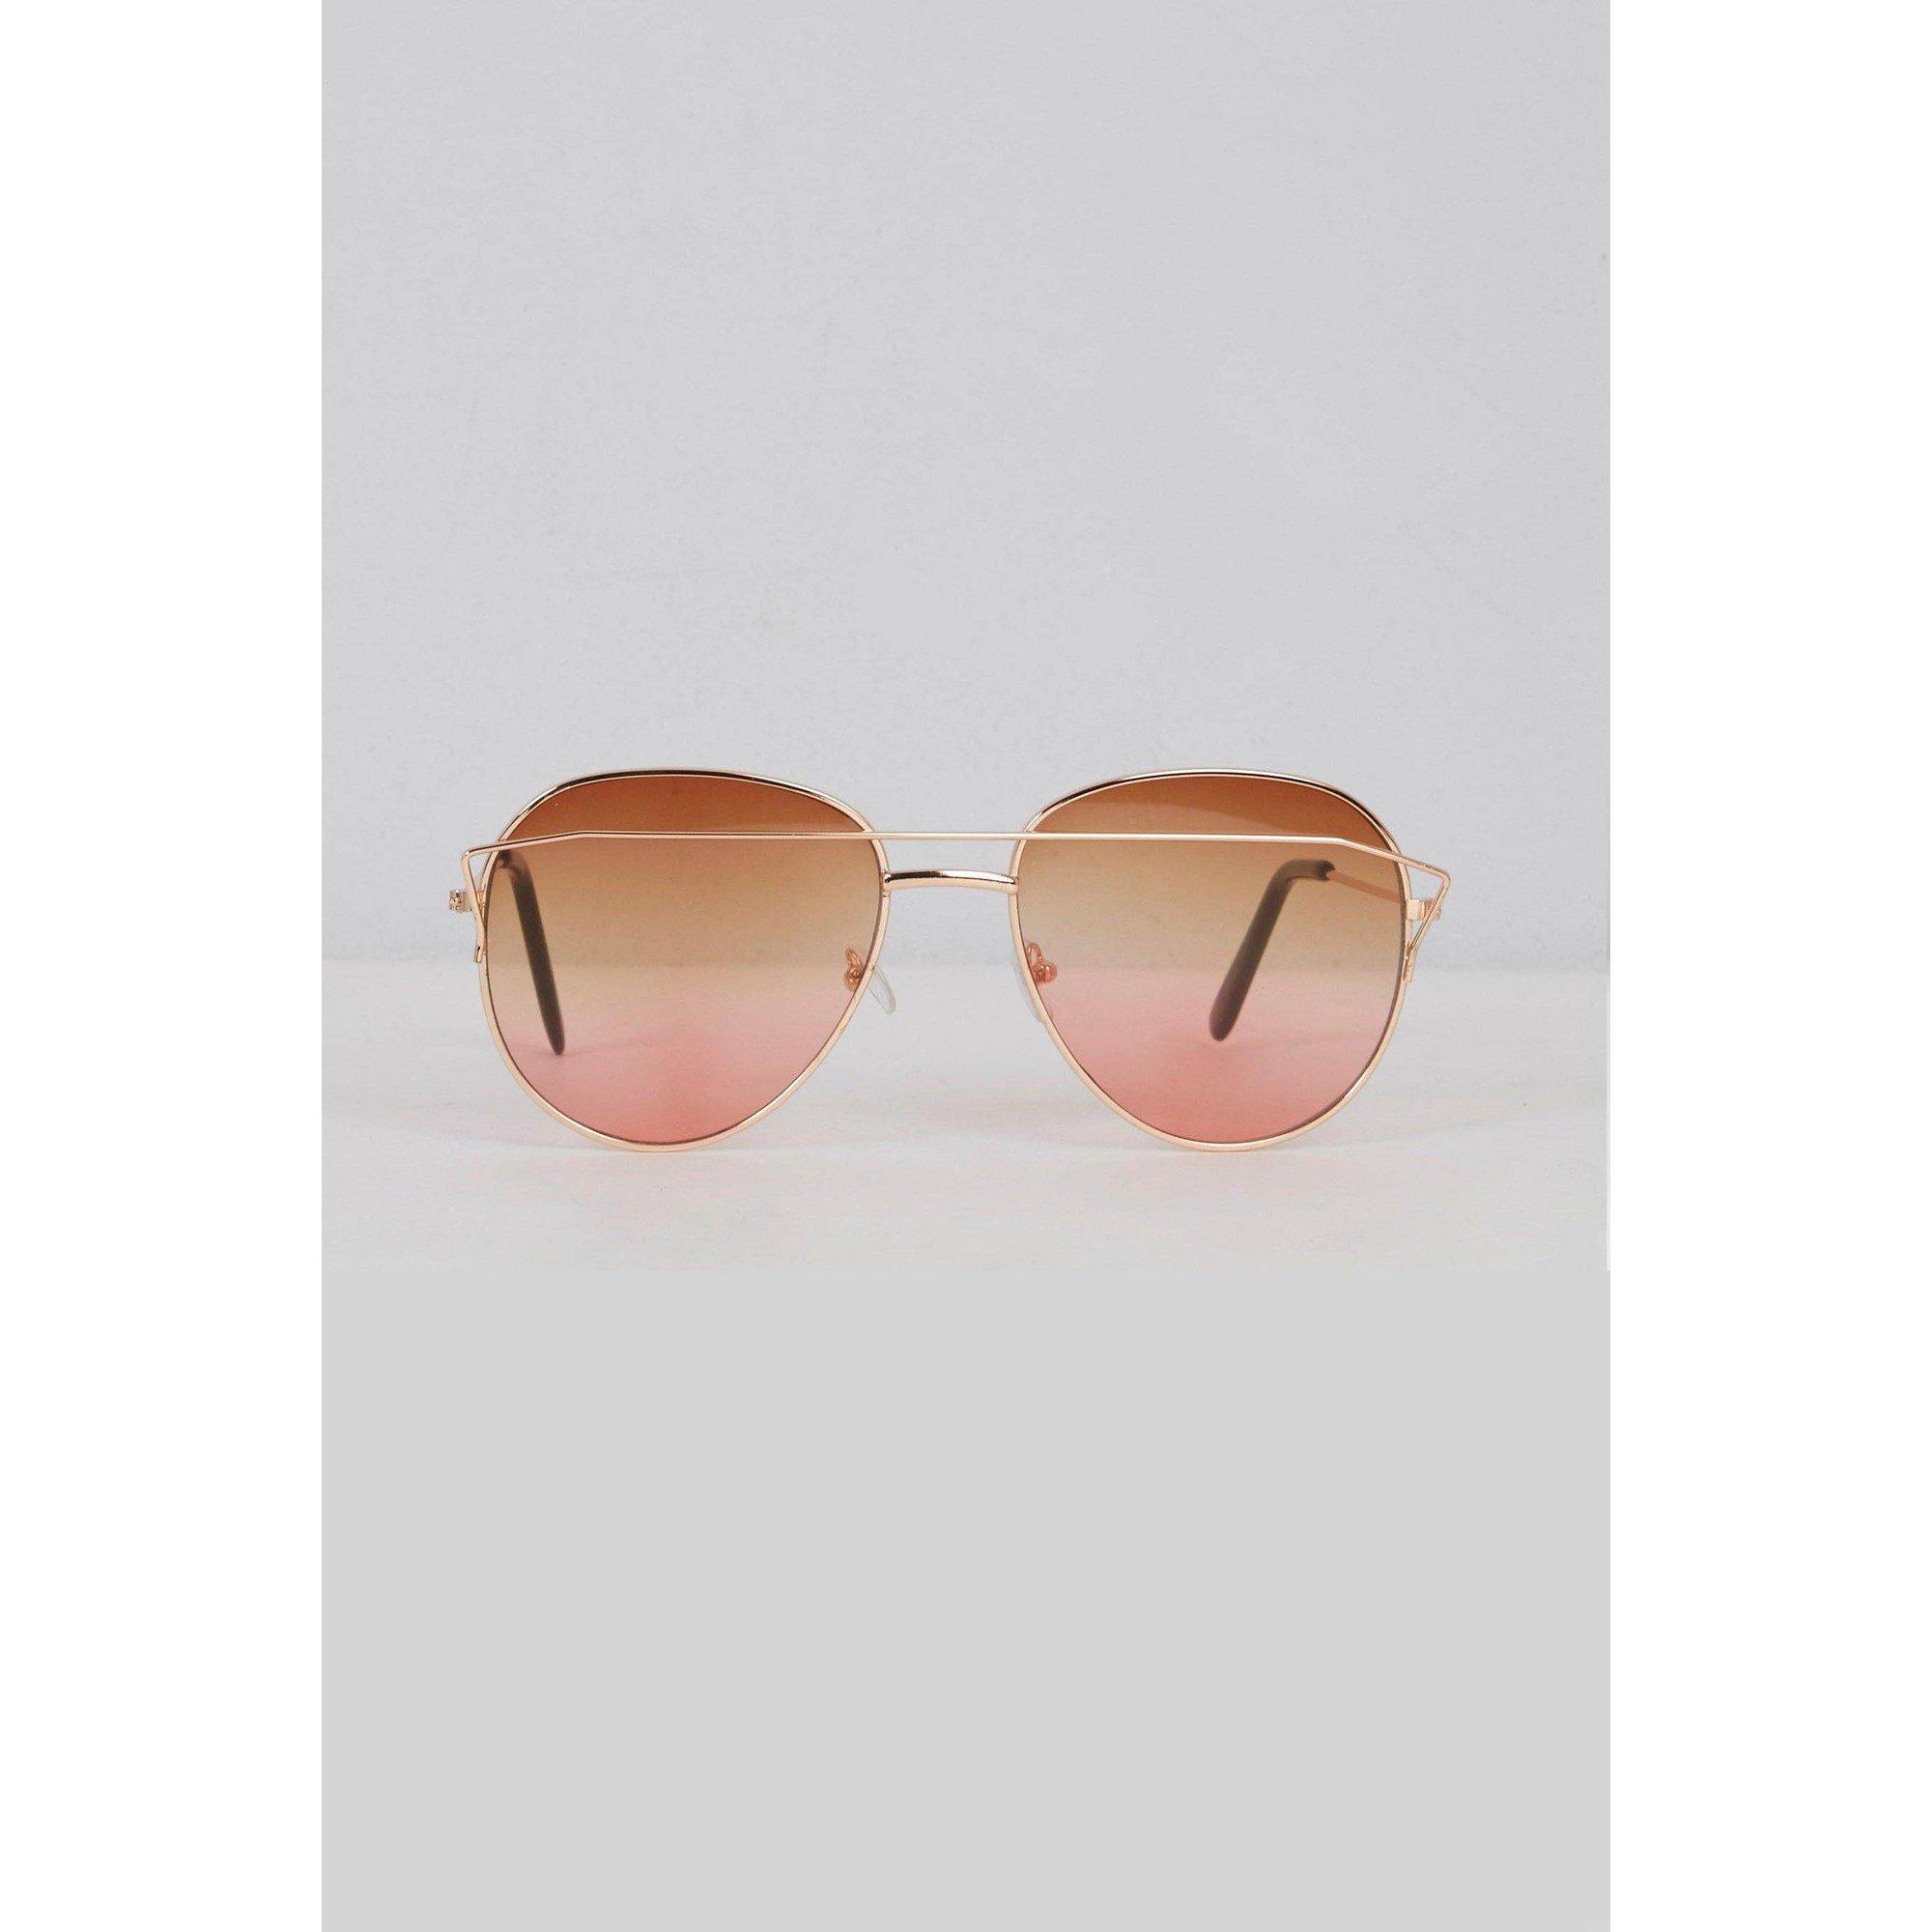 Image of Aviator Pink Lens Sunglasses